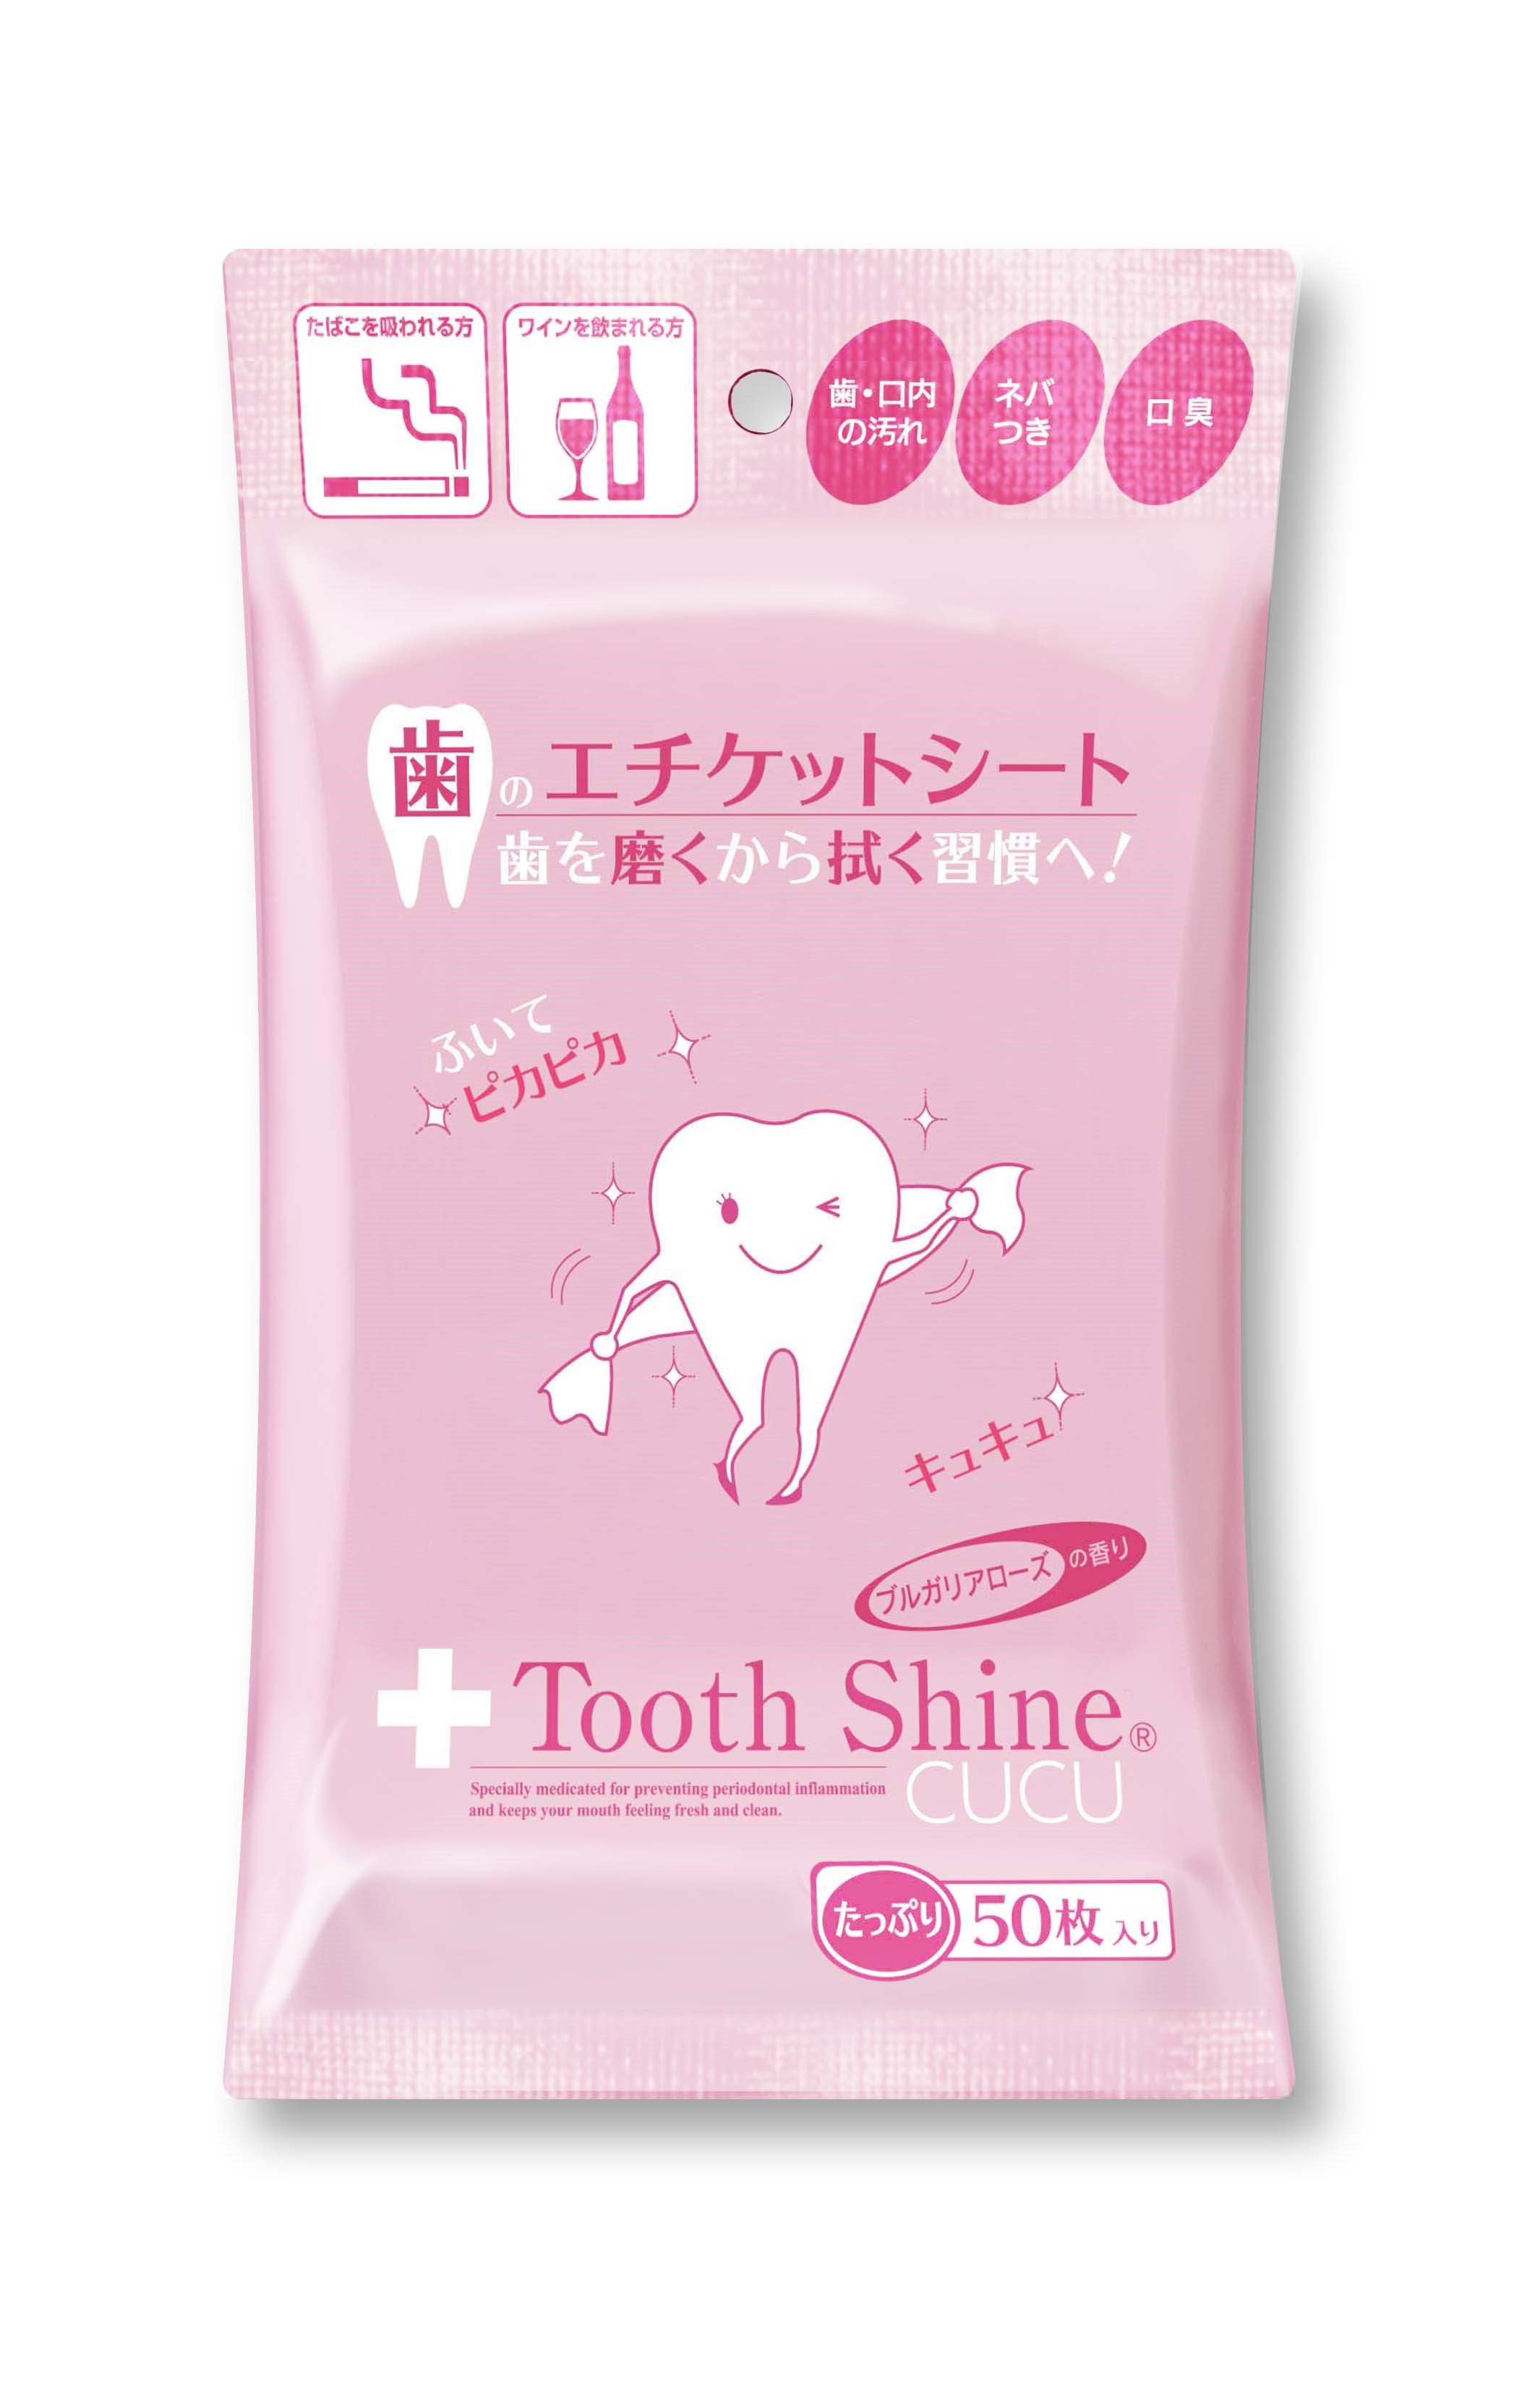 Tooth Shine CUCU